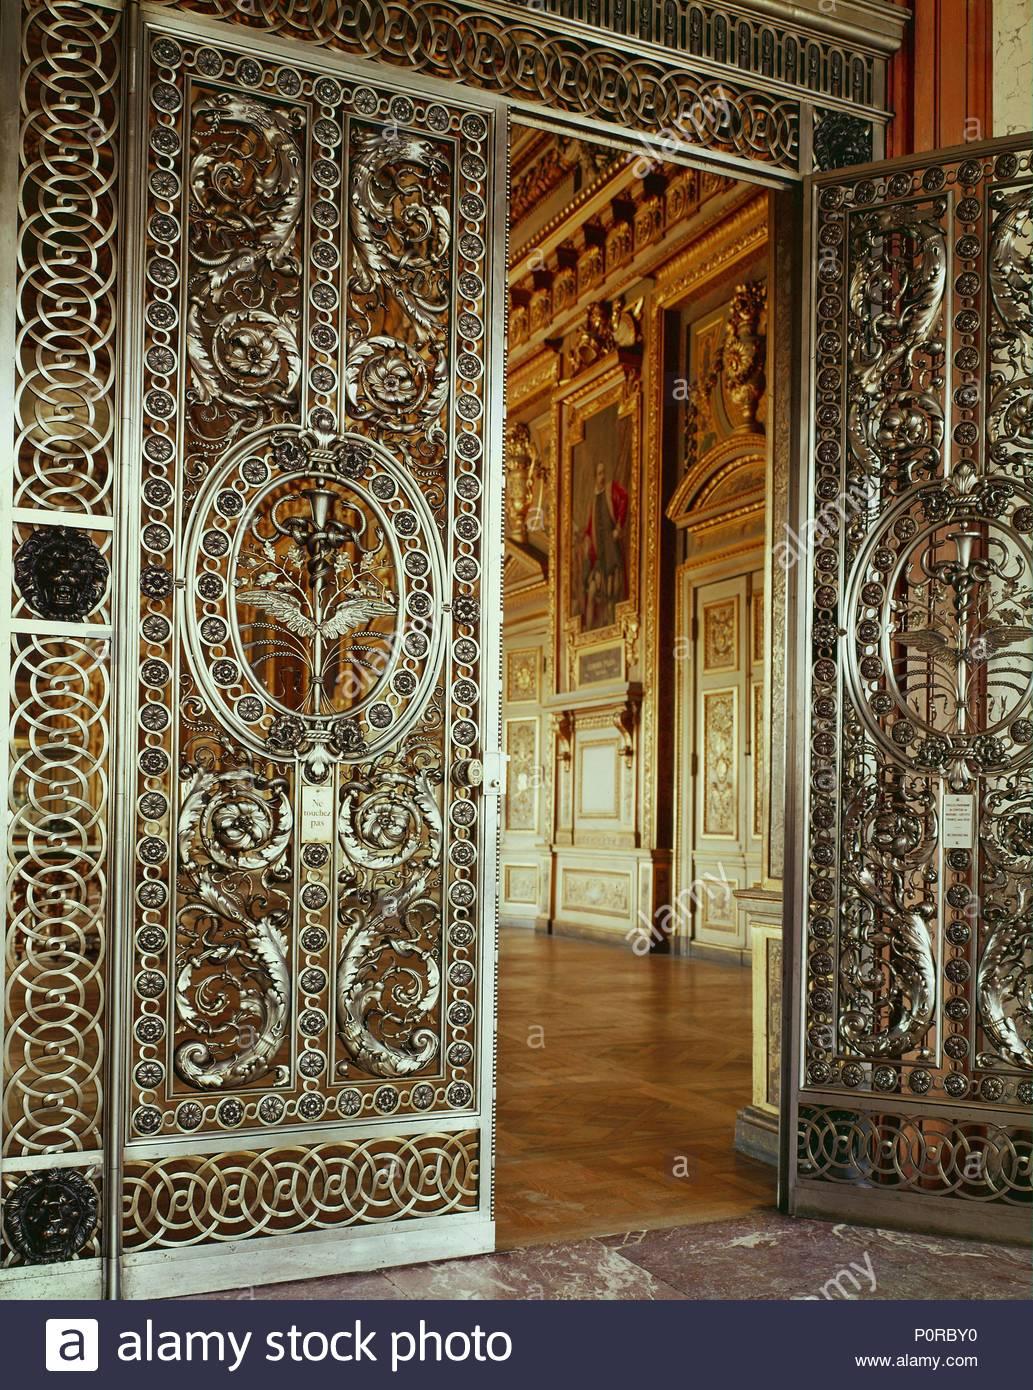 Doors of the Galerie d'Apollon, 1650-wrought iron and silver. From the Chateau de Maisons. Location: Louvre, Dpt. des Objets d'Art, Paris, France. - Stock Image